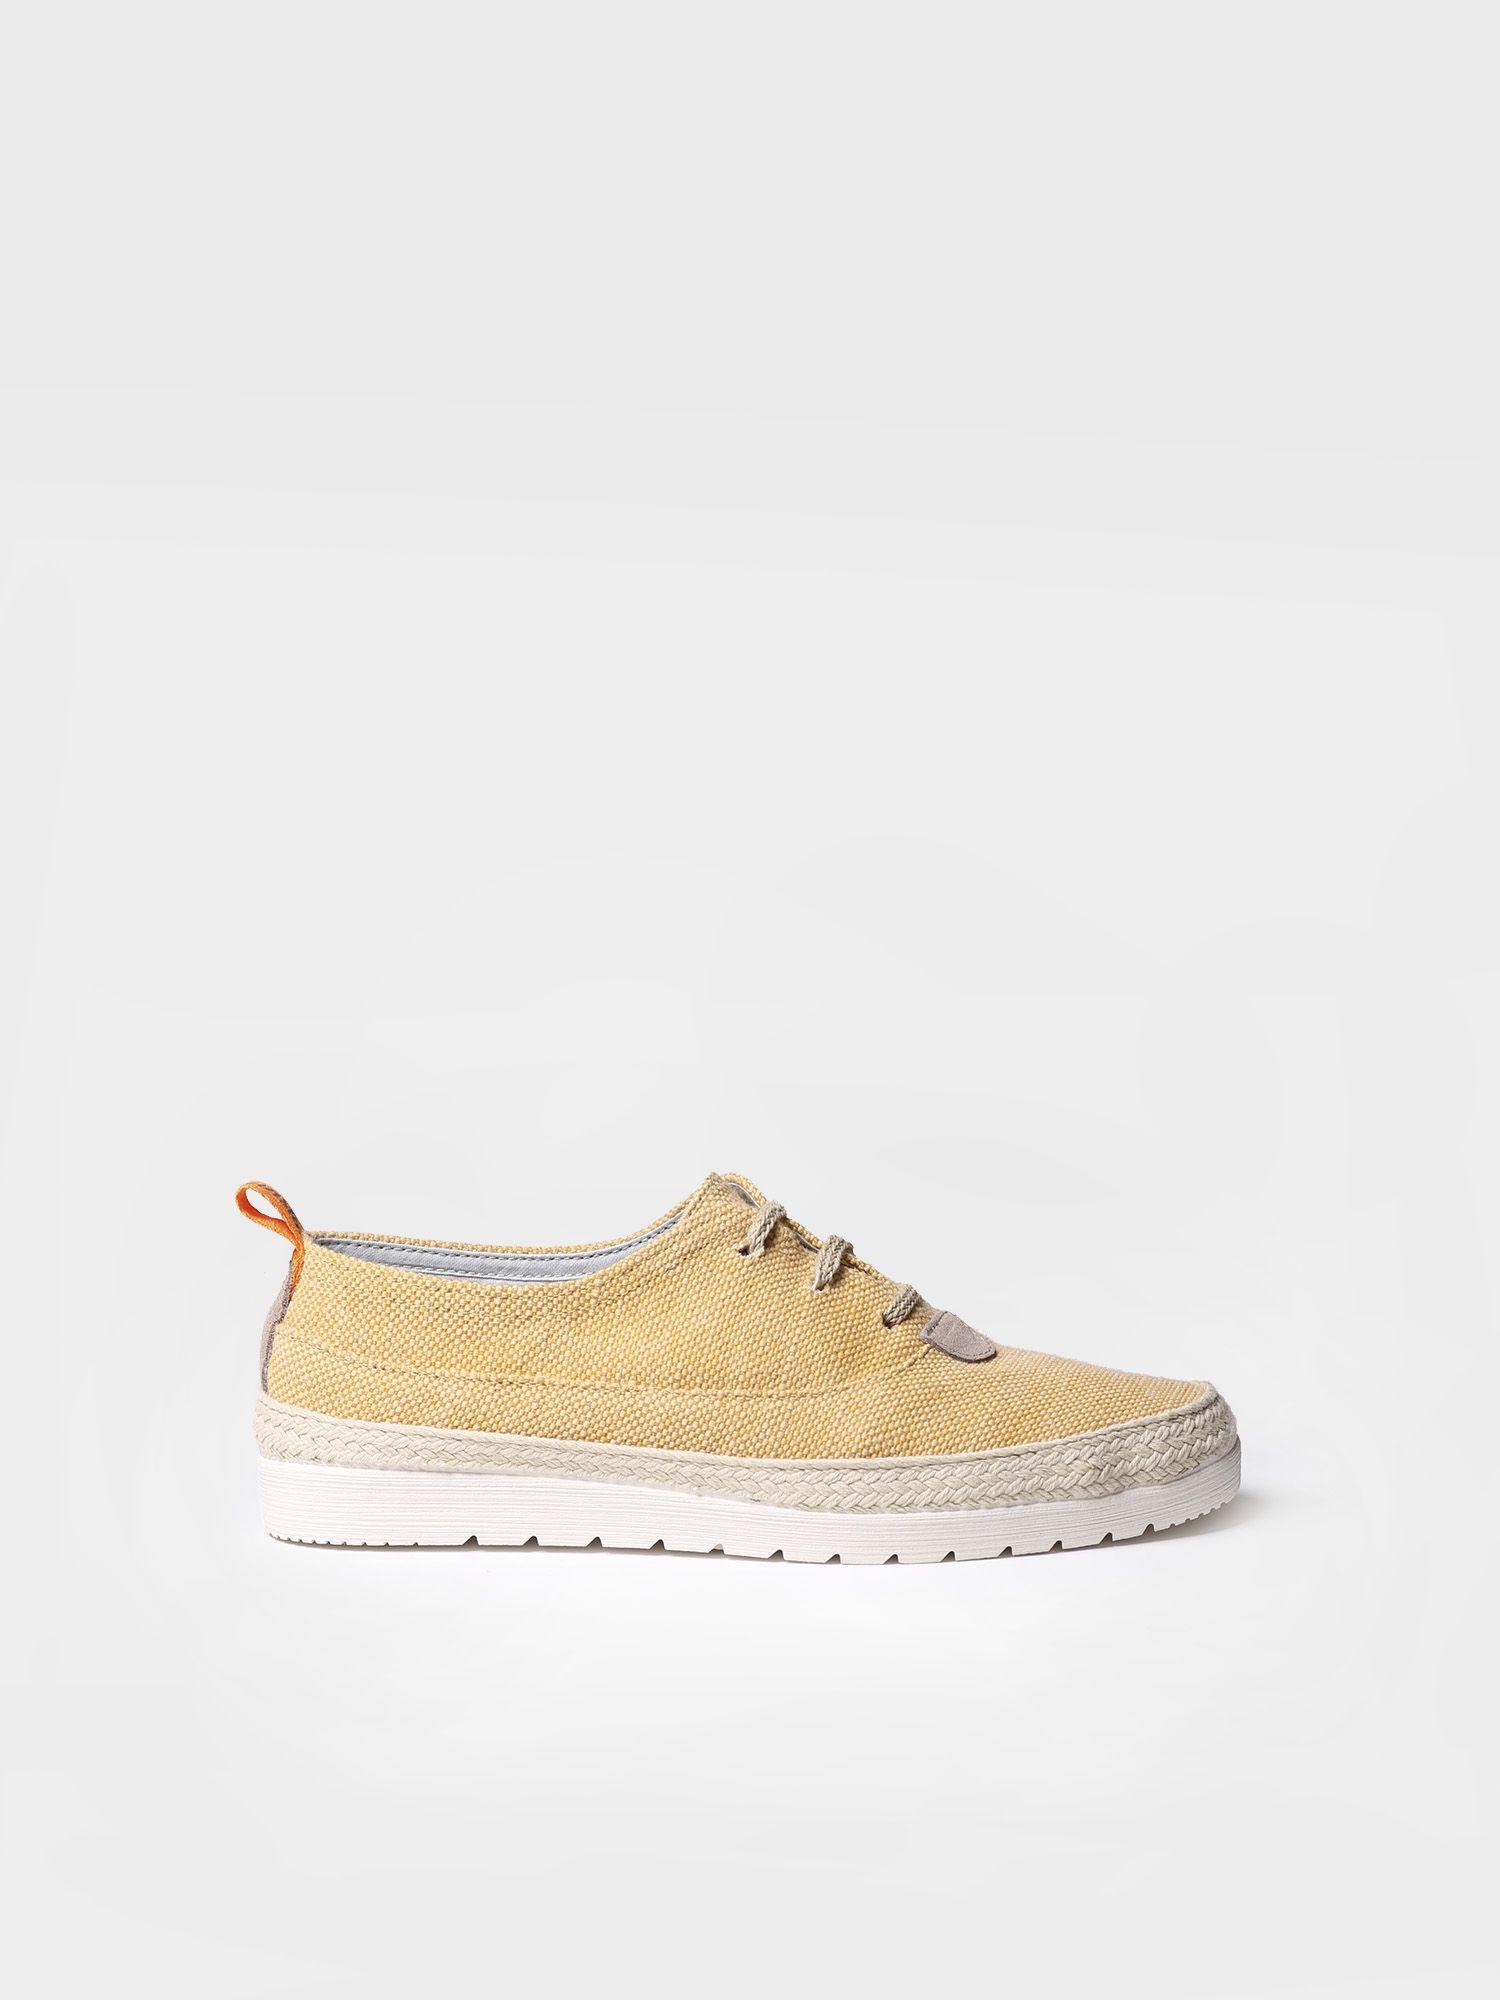 lace up sports shoes - BOB-SU